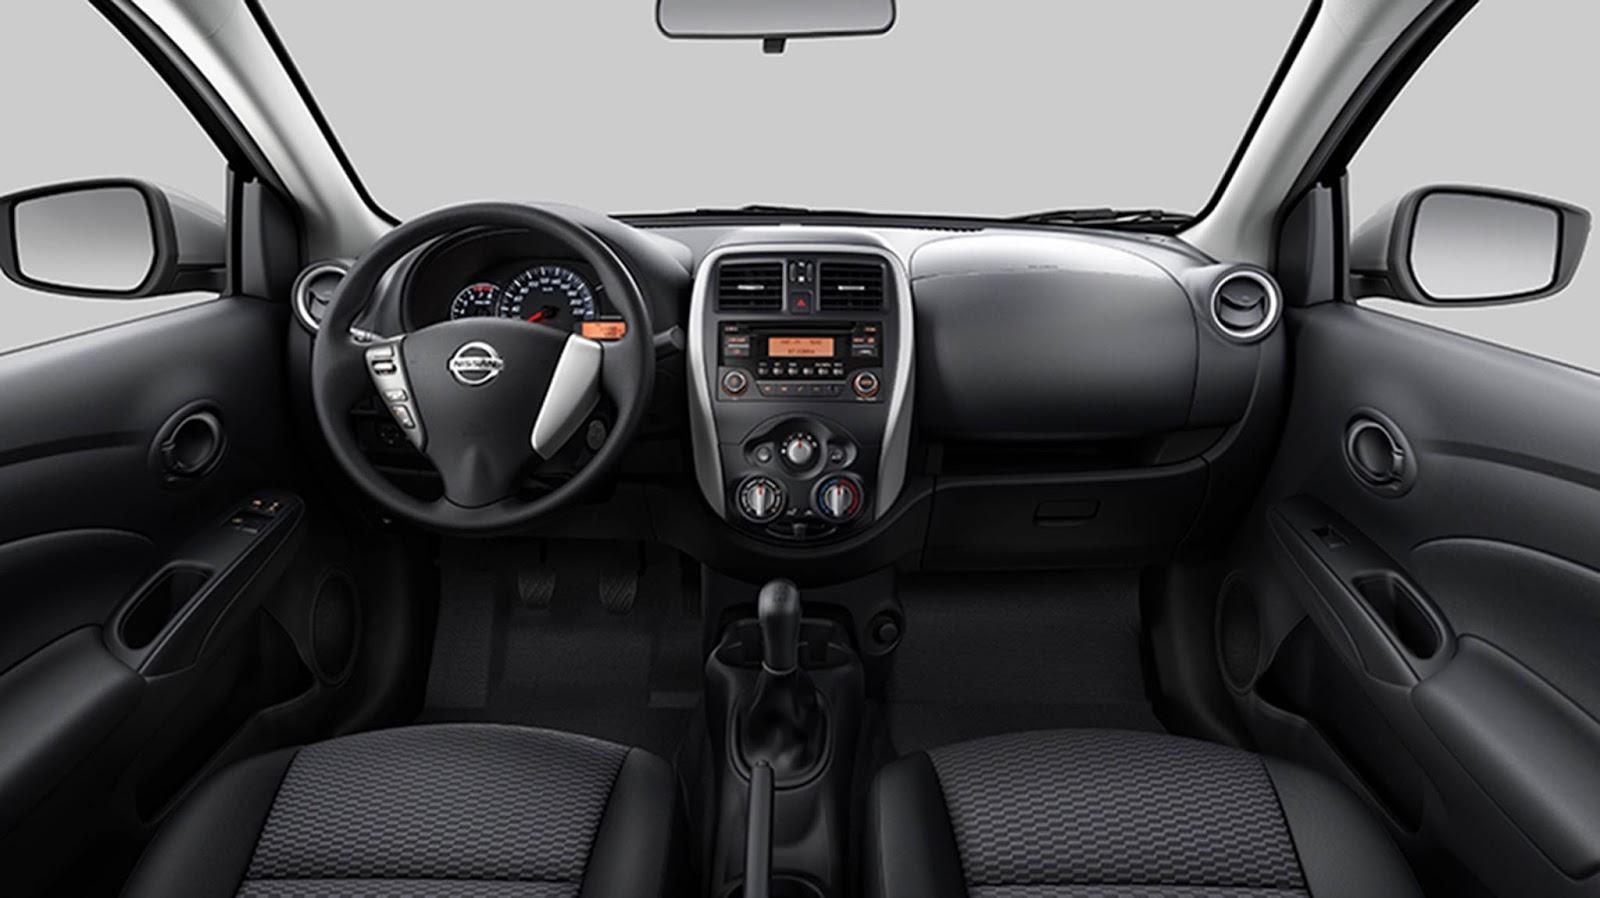 Novo Nissan Versa 2015 Pre 231 Os Consumo E Especifica 231 245 Es